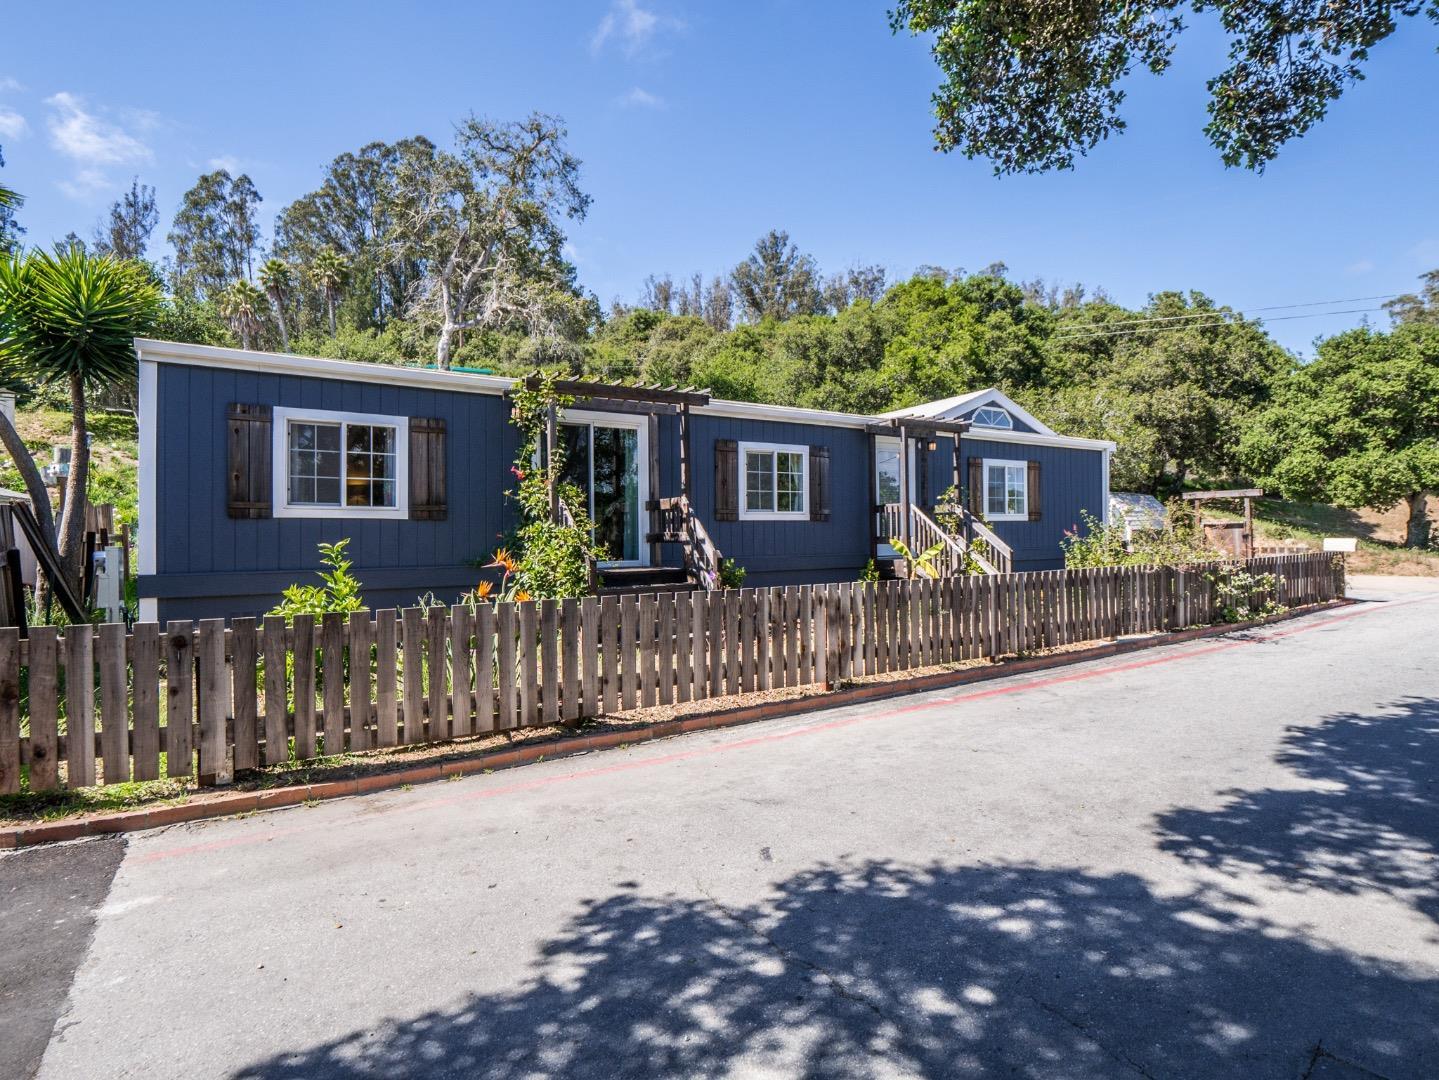 17779 Vierra Canyon Road Prunedale, CA 93907 - MLS #: ML81707457